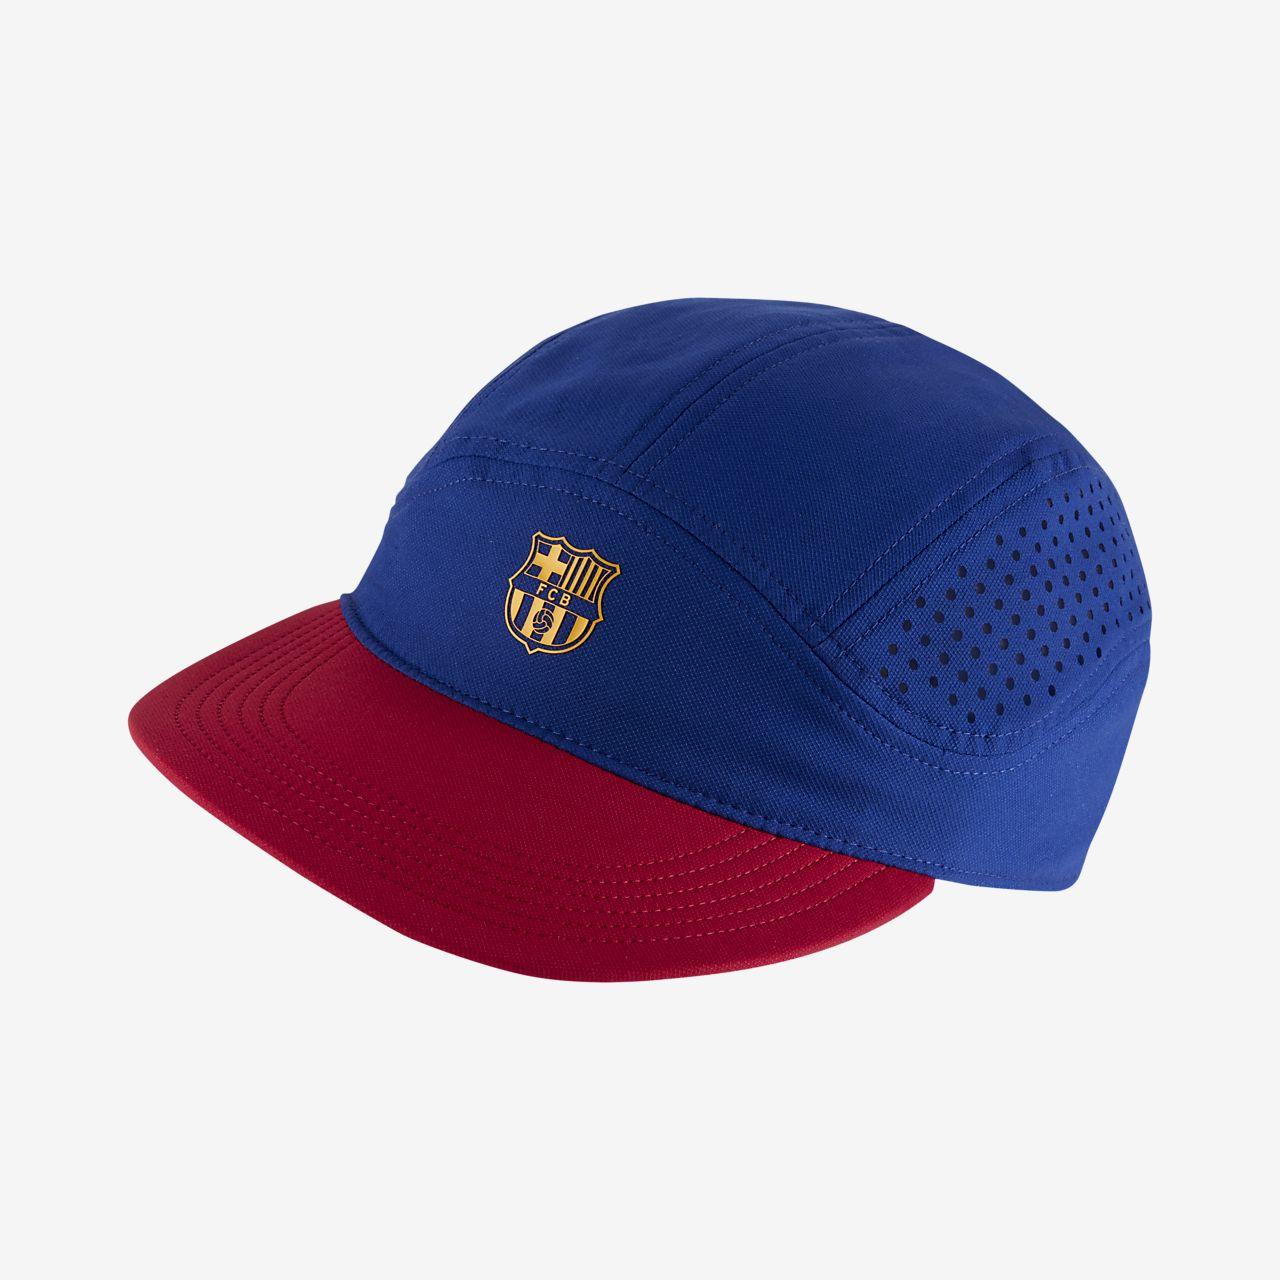 753c7deab9c81 Nike Dri-FIT FC Barcelona Tailwind Adjustable Hat